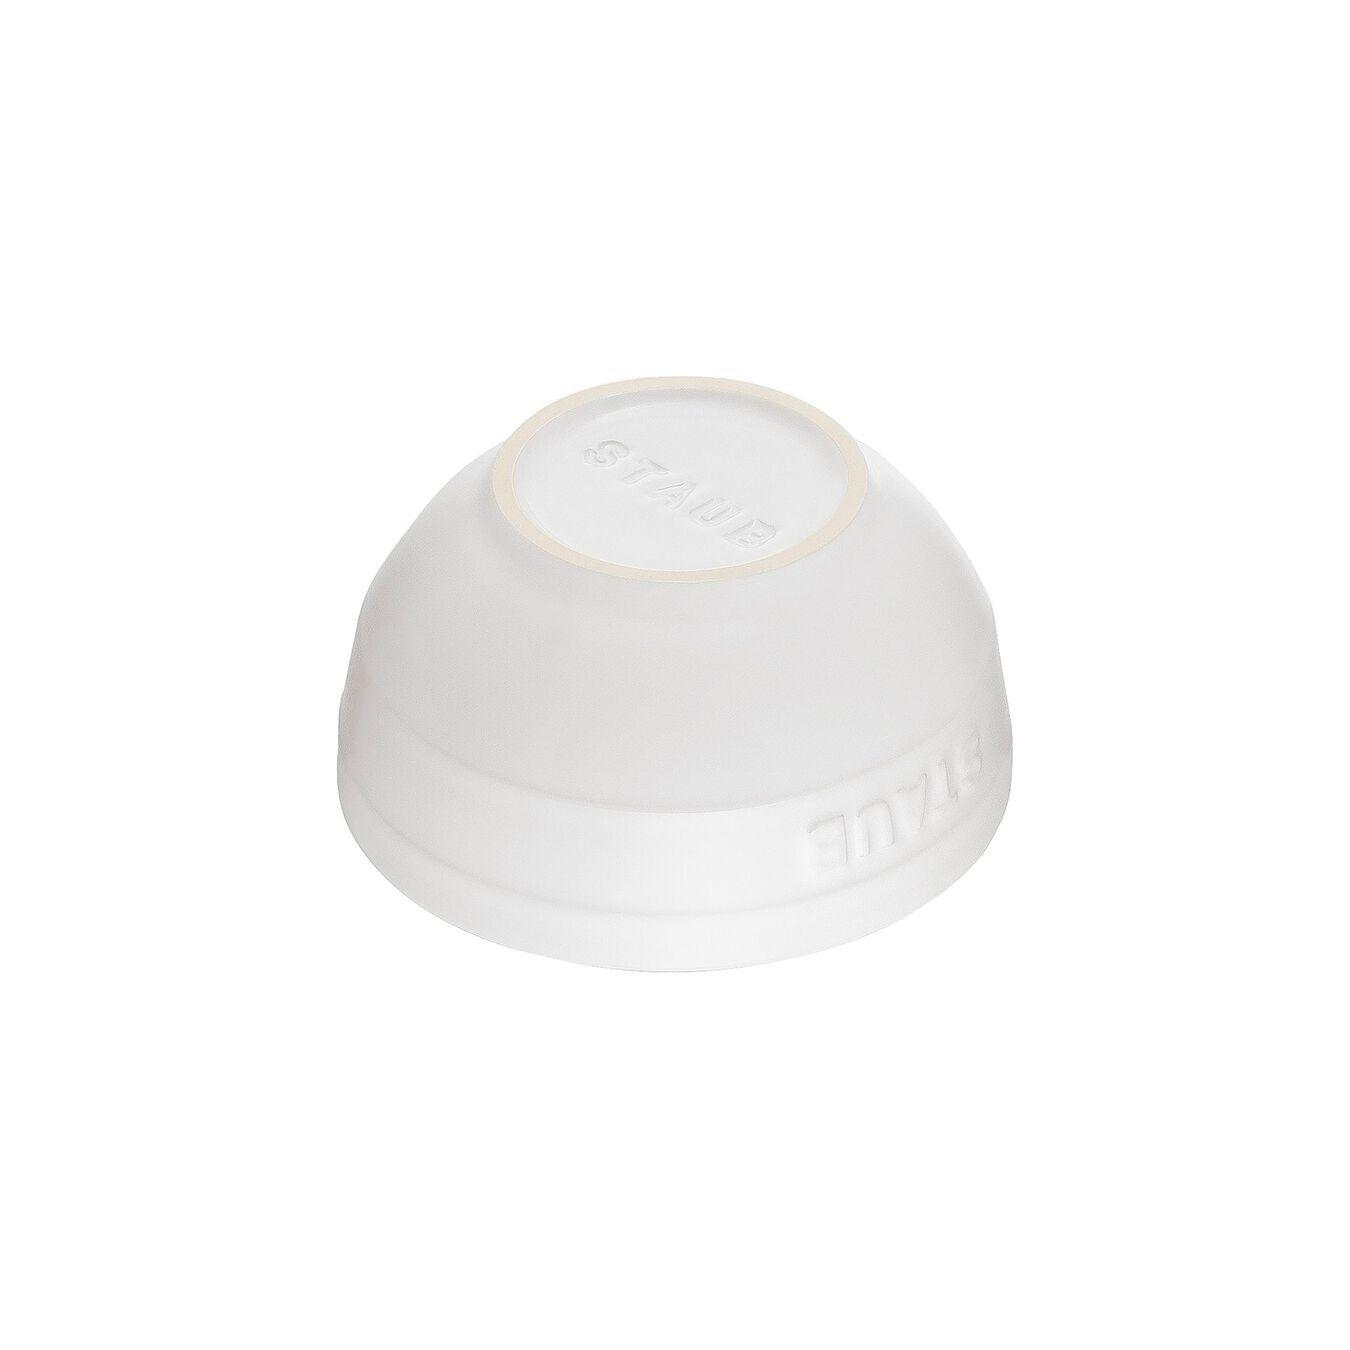 Bowl 12 cm, Cerâmica, Branco puro,,large 2